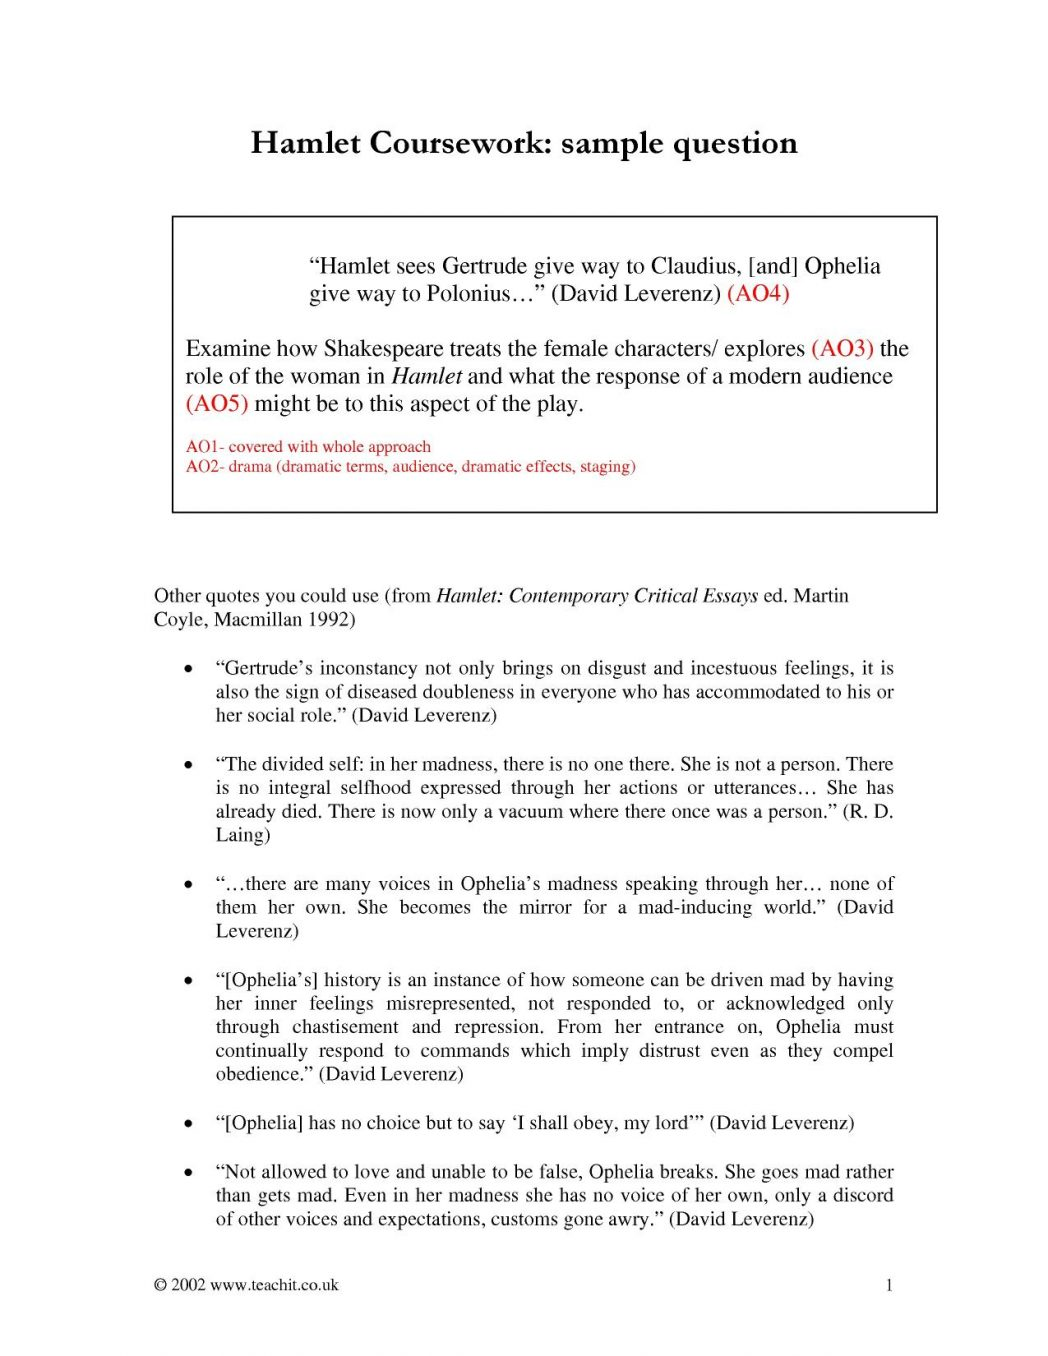 009 Essay Example Hamlet On Revenge Topics Outline 1048x1356 Stupendous Madness Plan Theme Conclusion Full